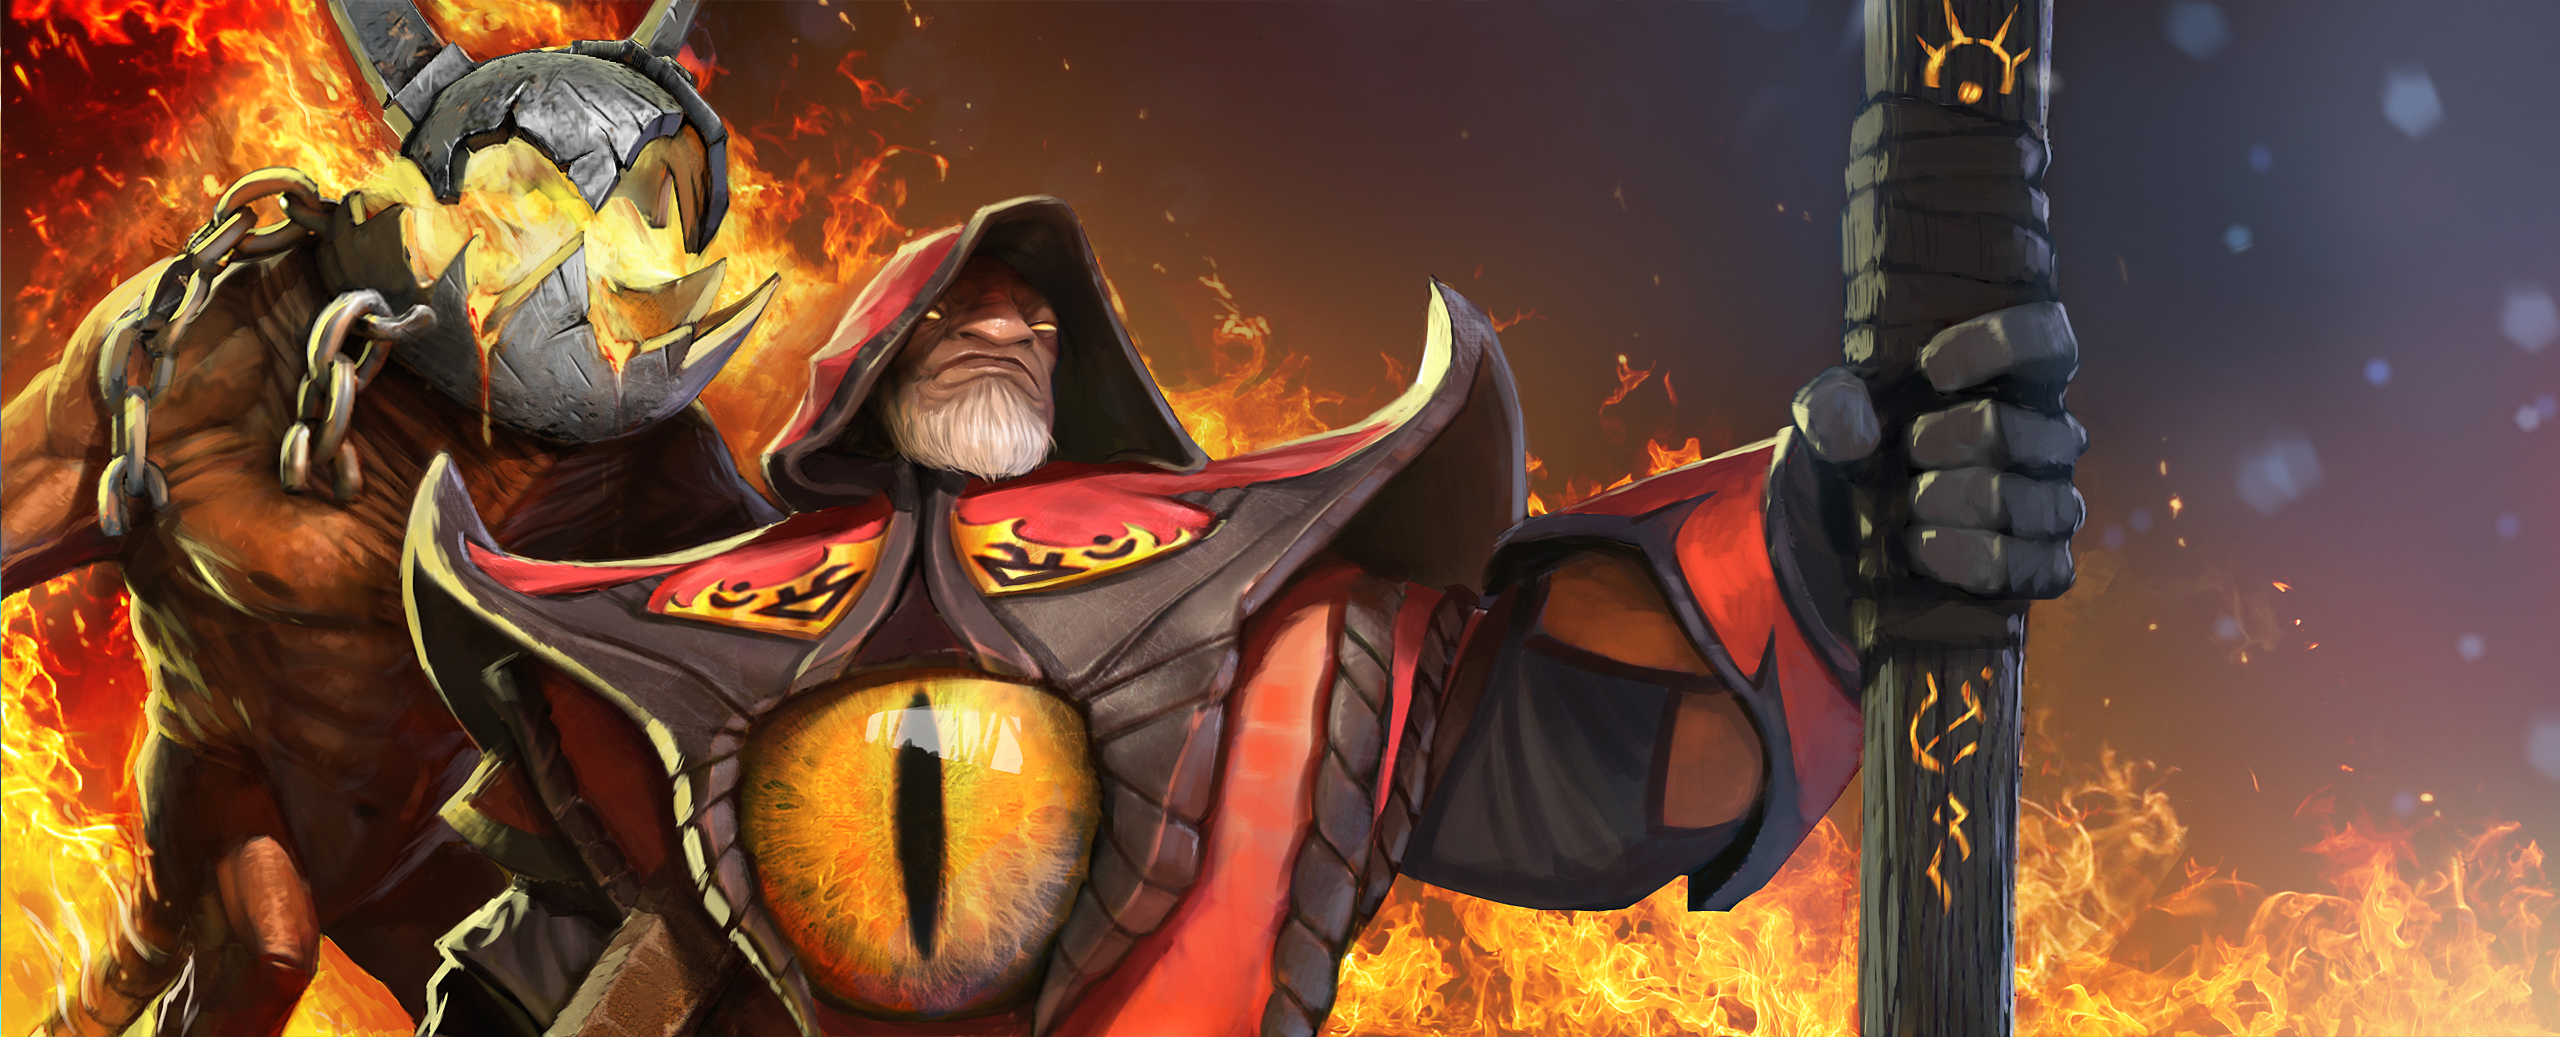 Warlock Build Guide DOTA 2 The Black Grimoire A Guide To Warlock